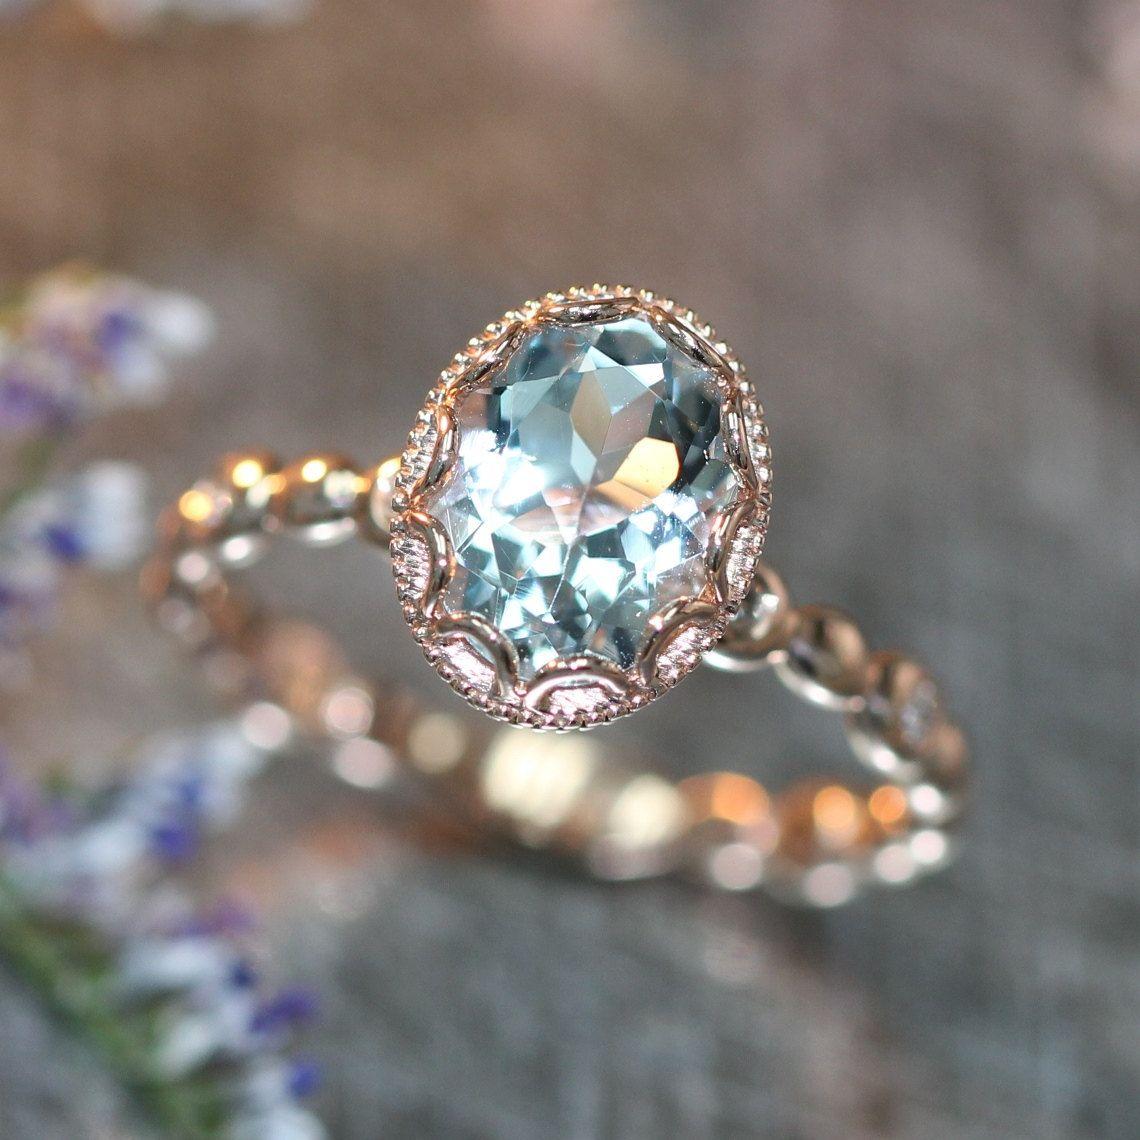 14k Rose Gold Floral Aquamarine Engagement Ring in Pebble